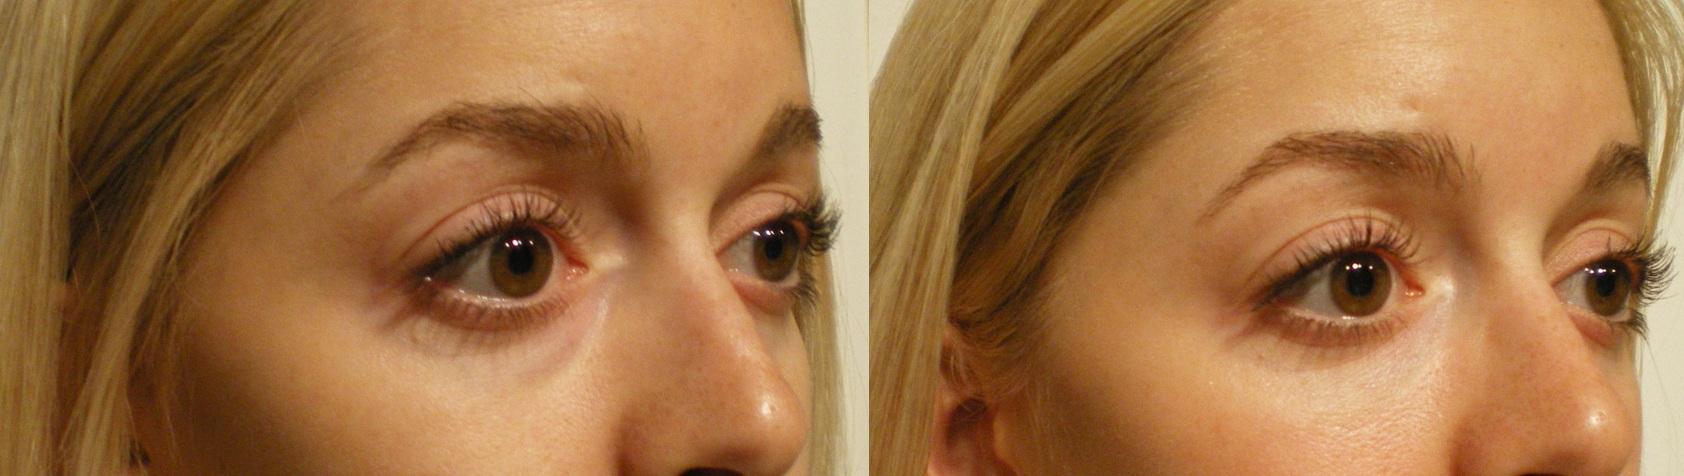 undereye-bags gaunt fix cosmetic clinic dublin